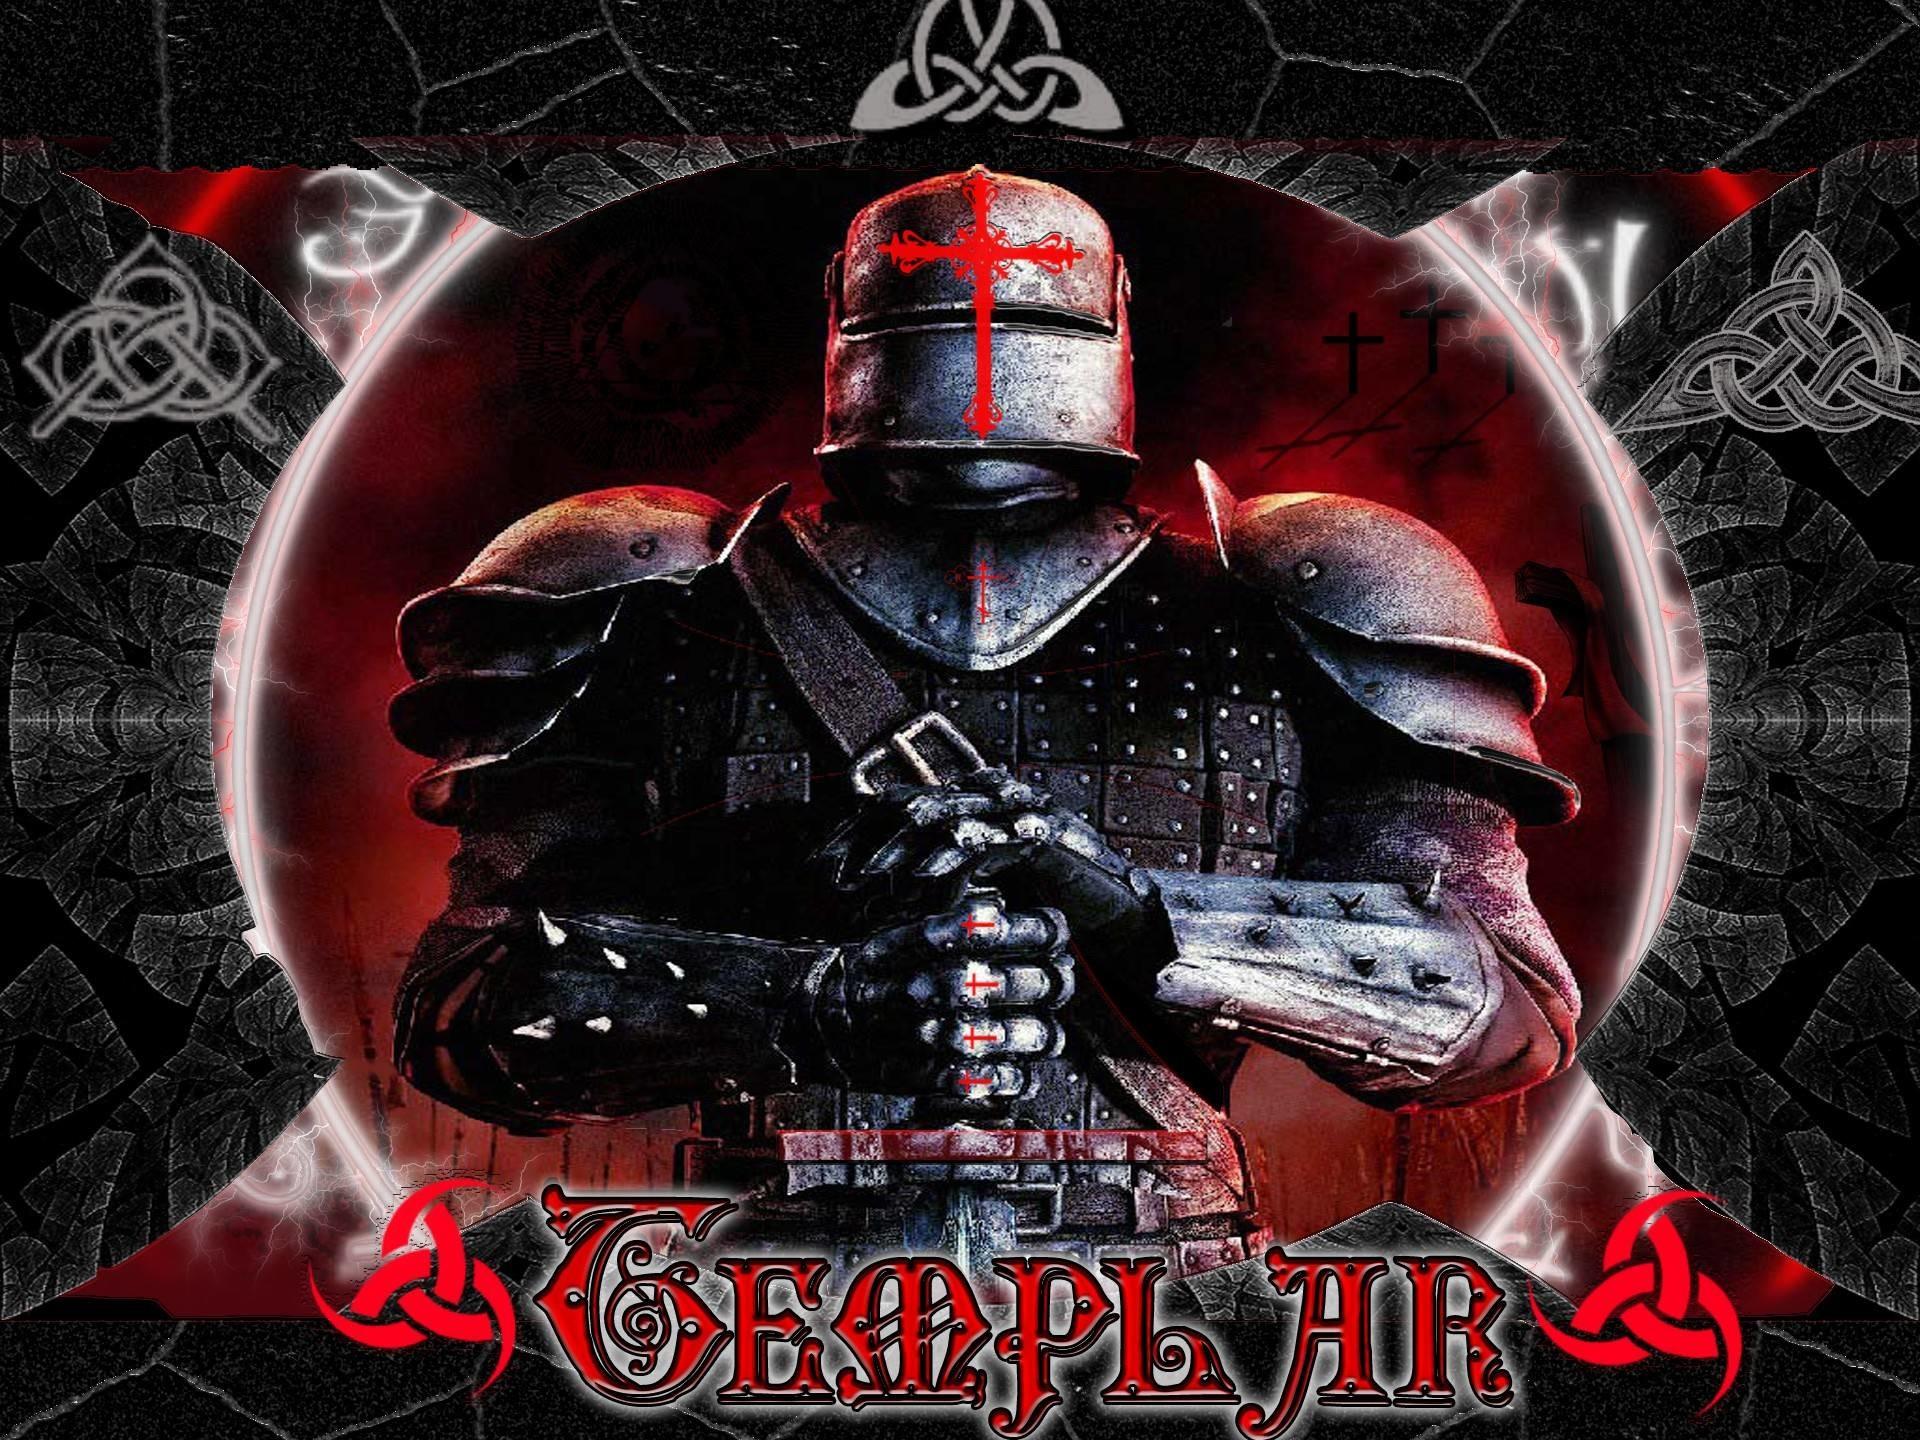 Templar Knight Wallpaper Android Apps on Google Play